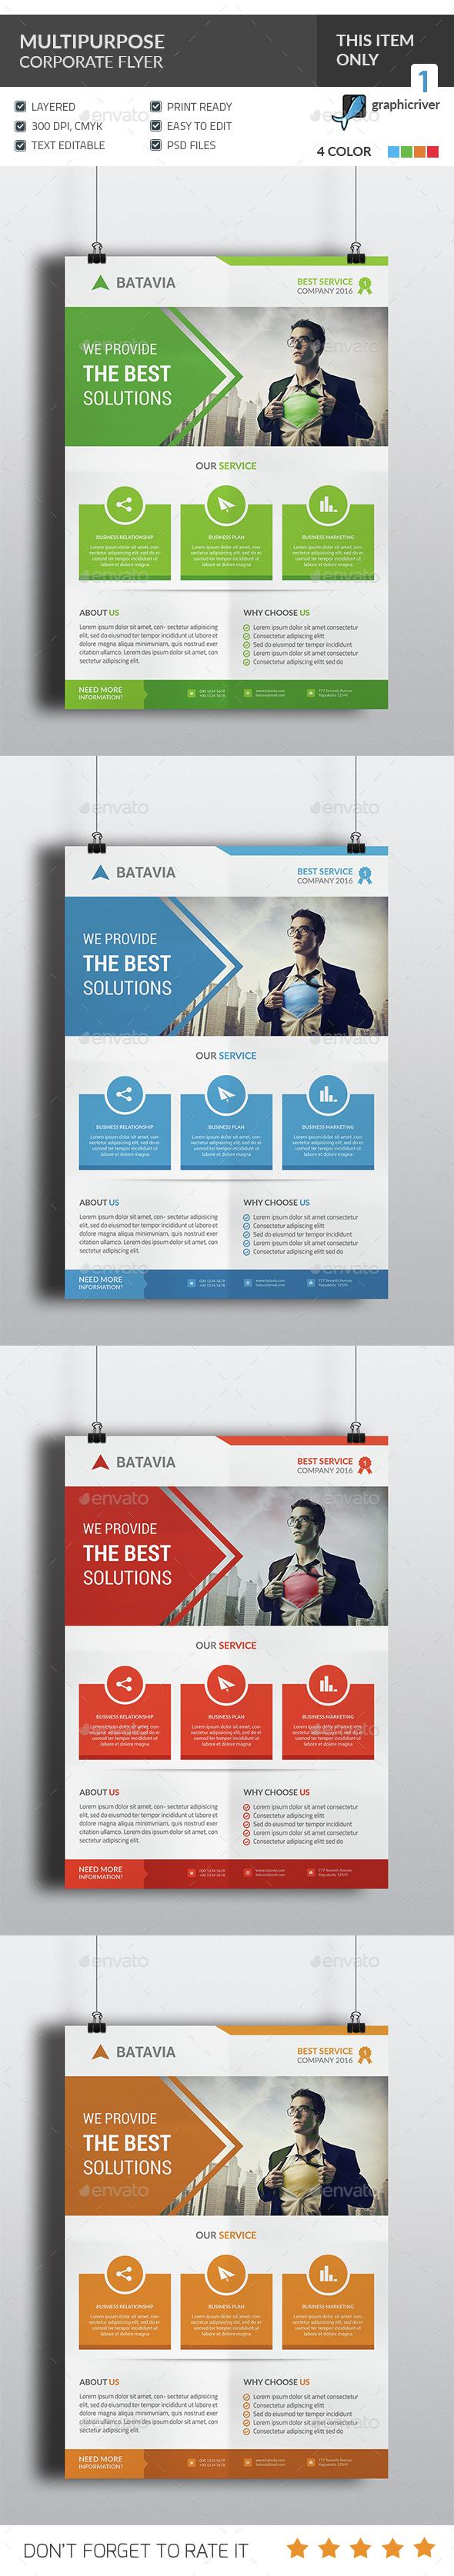 Multipurpose Corporate Flyer - Corporate Flyers